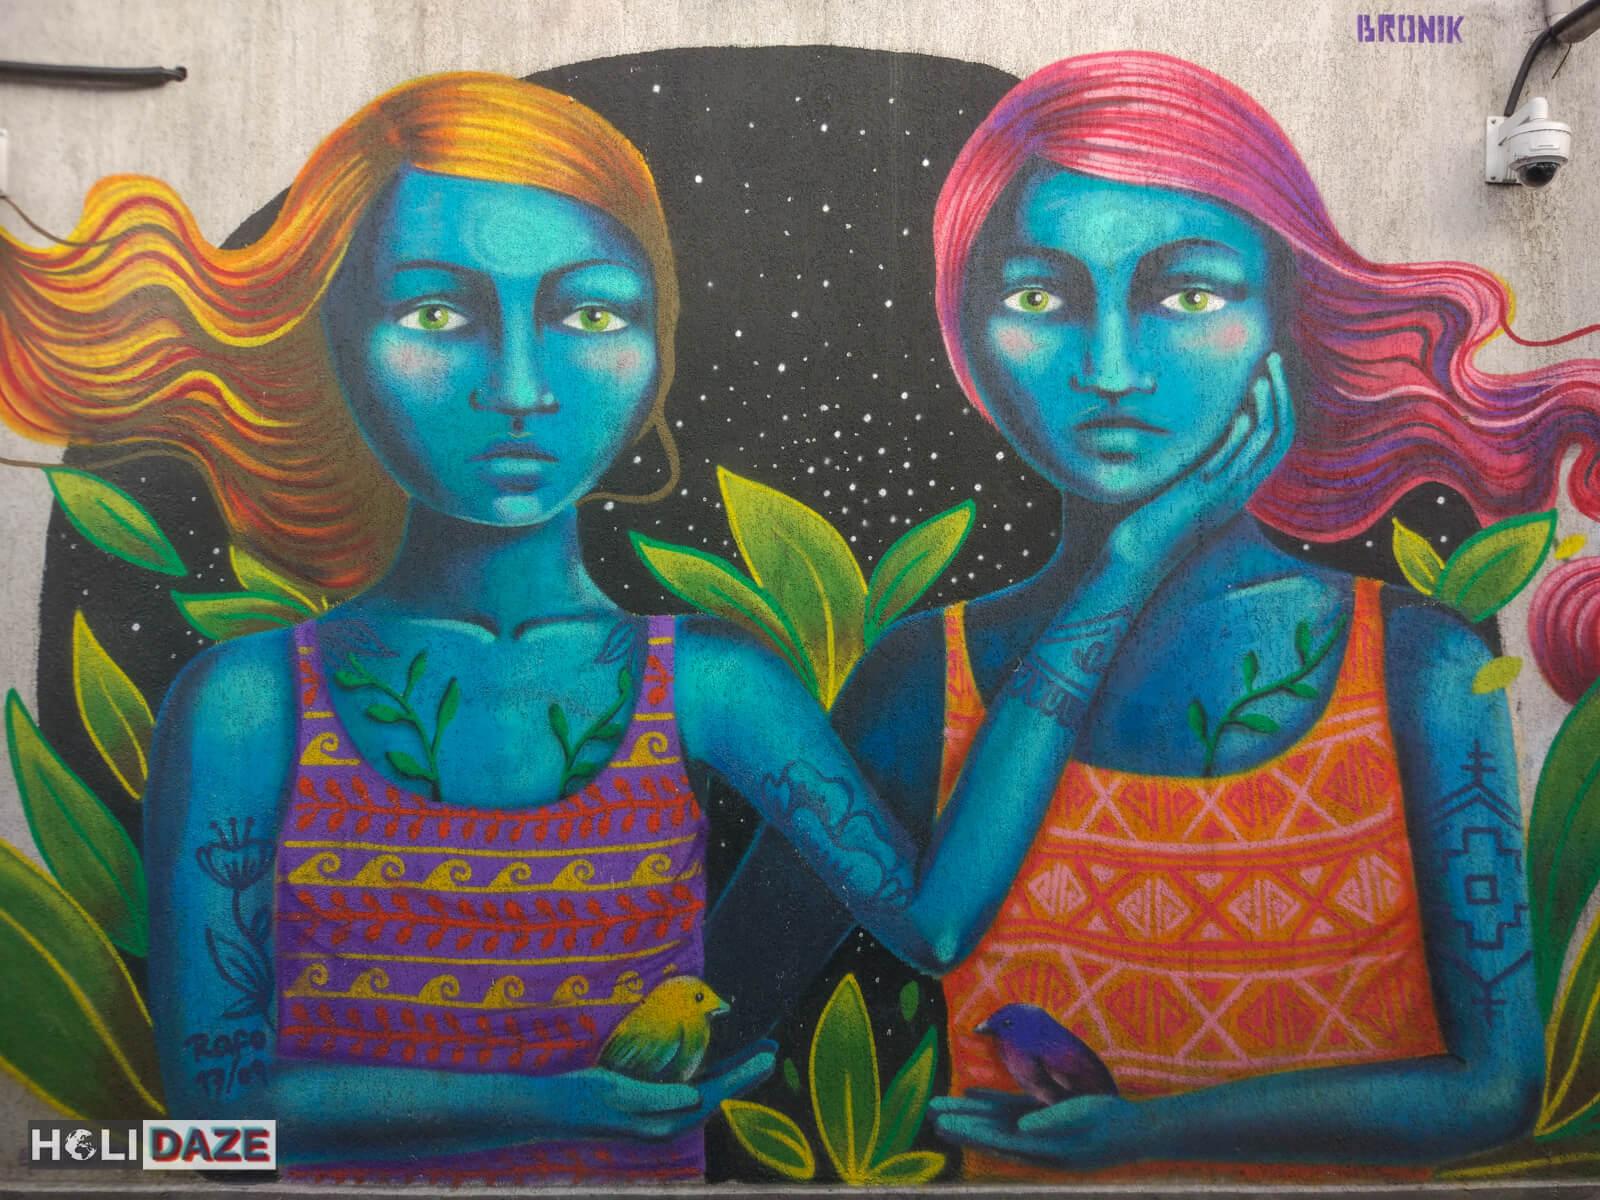 Tbilisi street art found near the Nikoloz Baratashvili Bridge